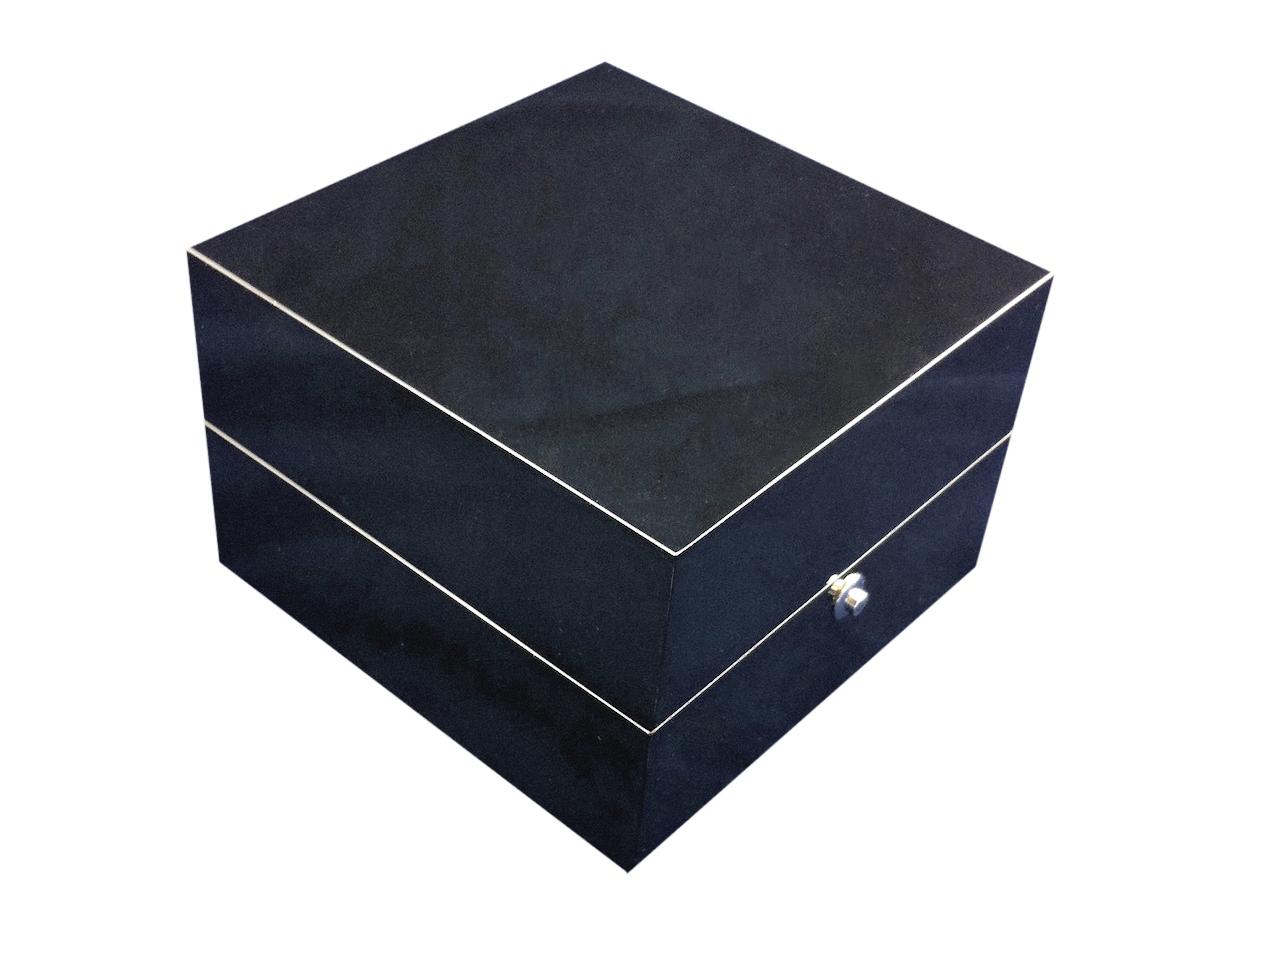 Glossy black ring box with white interior